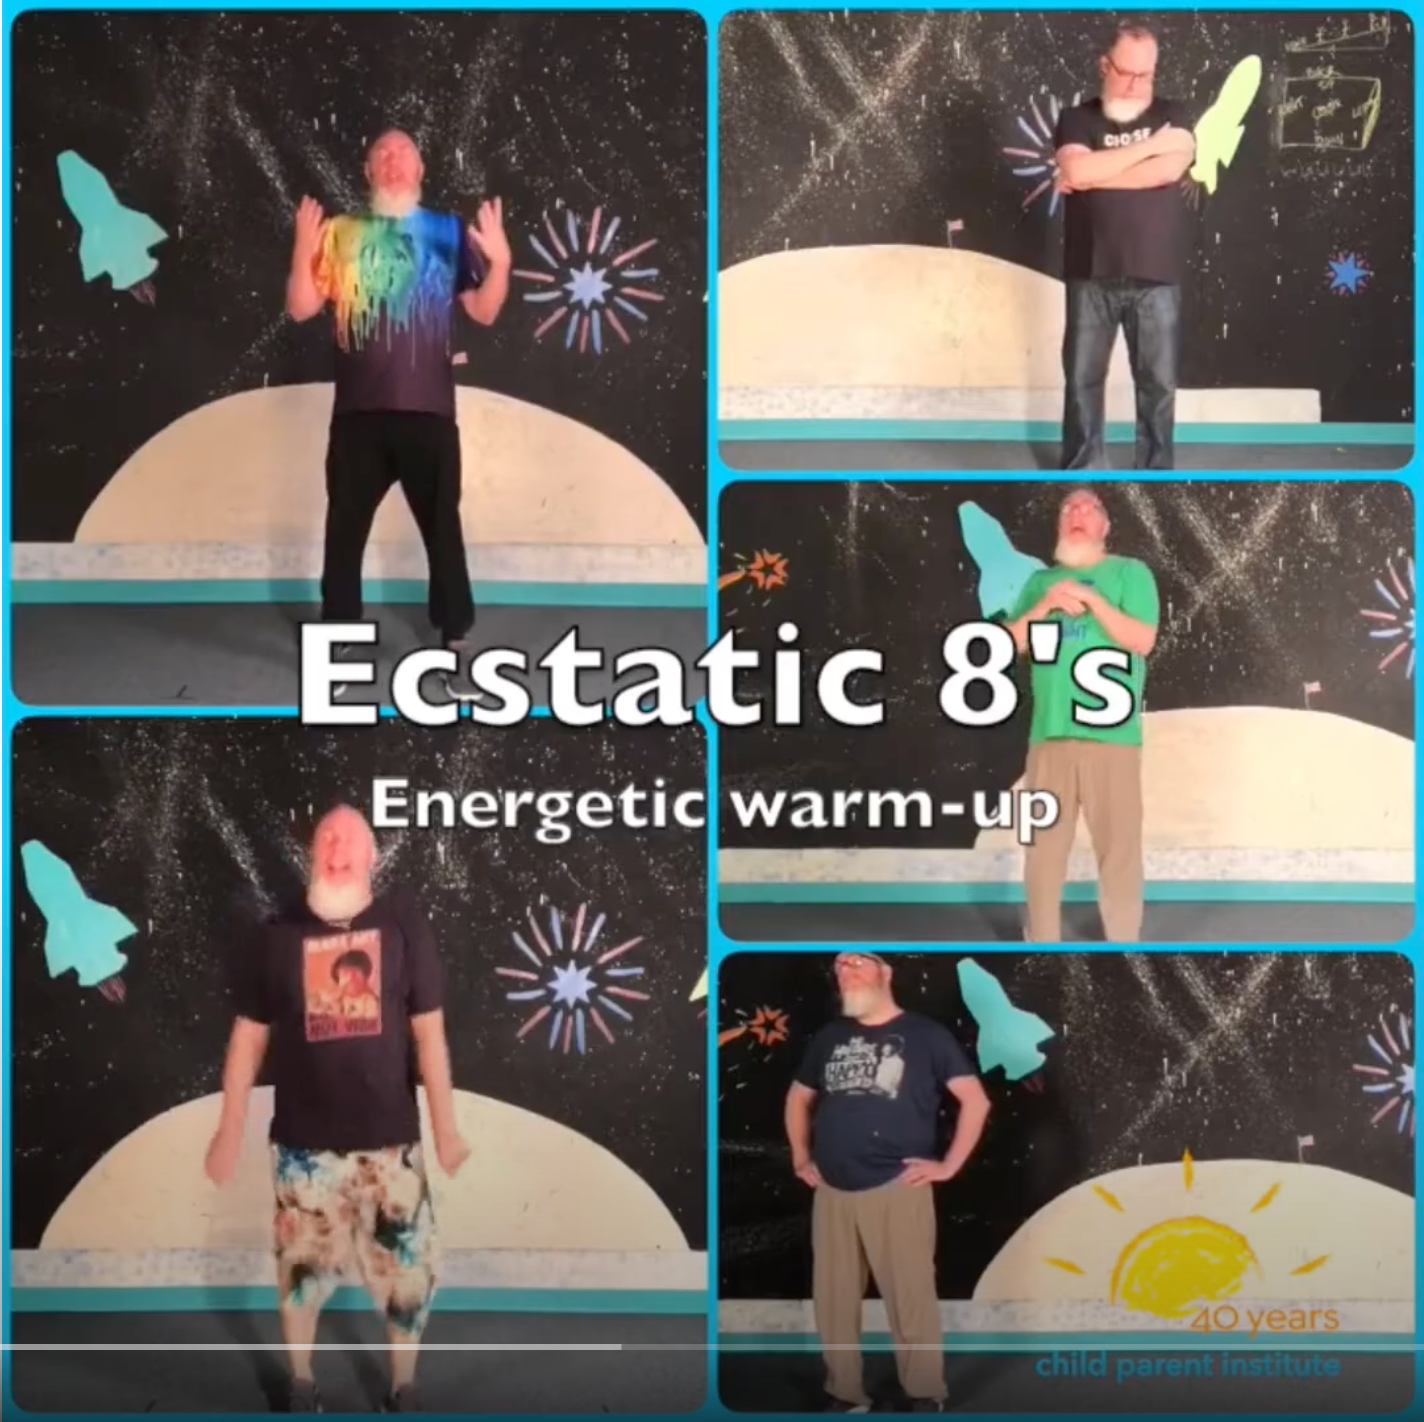 Ecstatic Eights